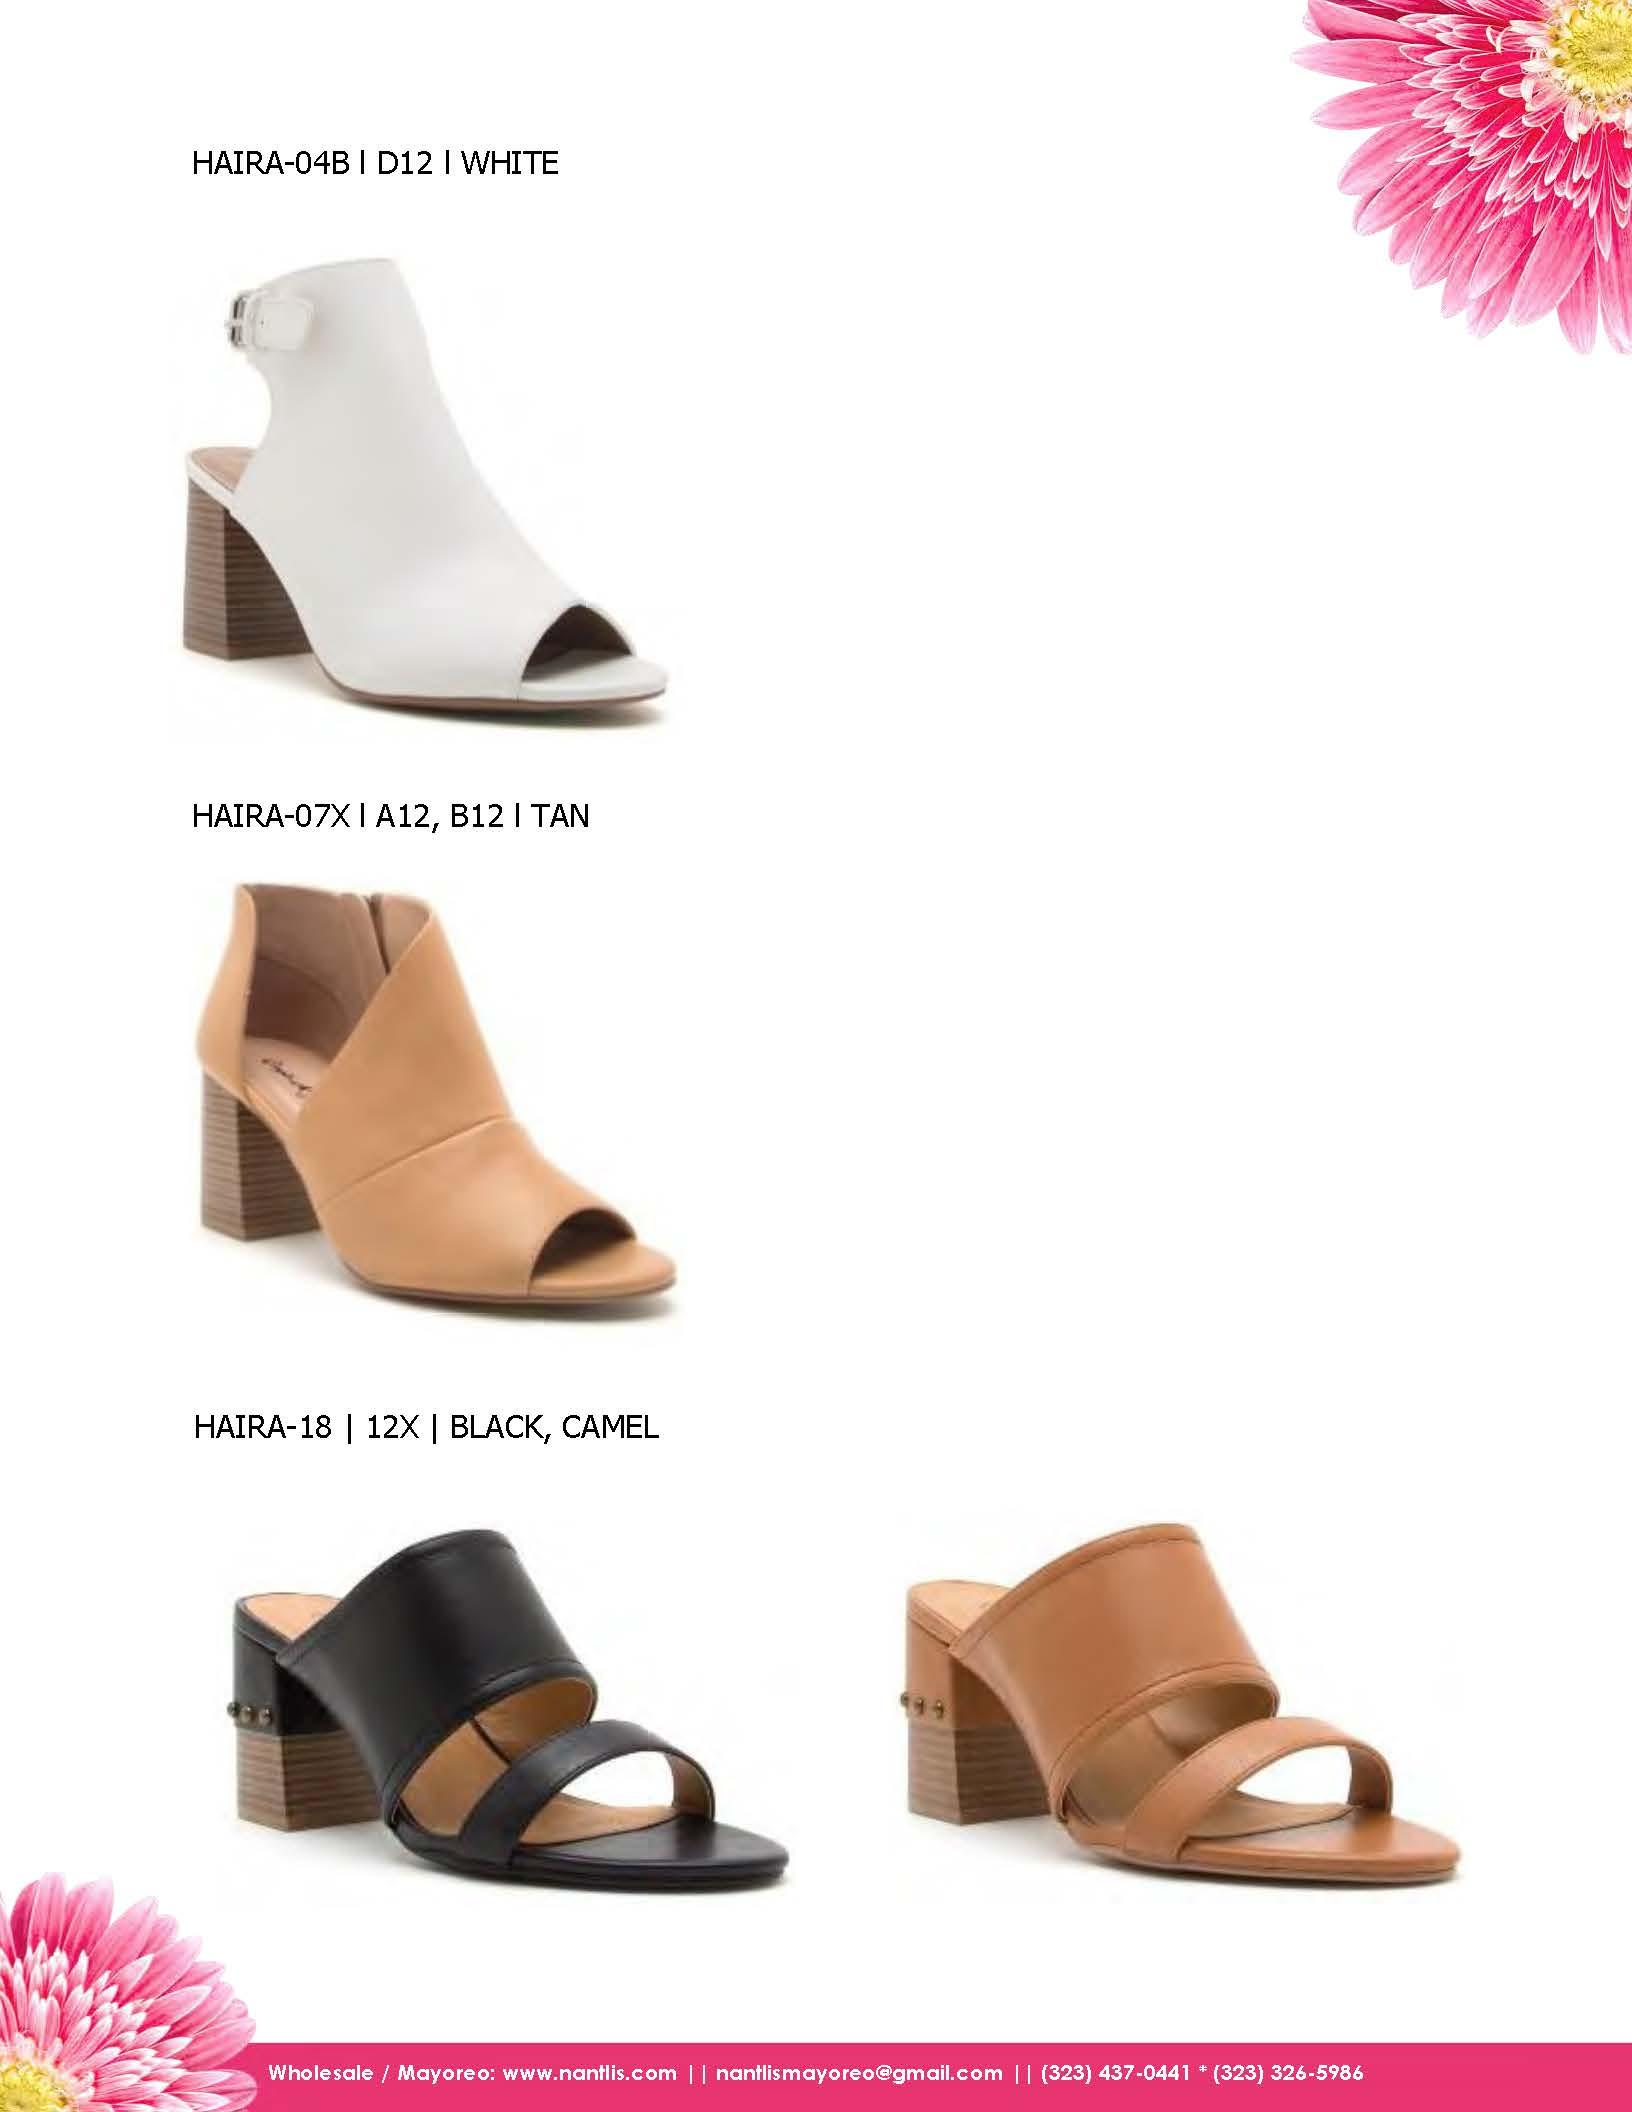 Nantlis Vol QU43 Zapatos para mujer mayoreo Wholesale shoes for women_Page_22